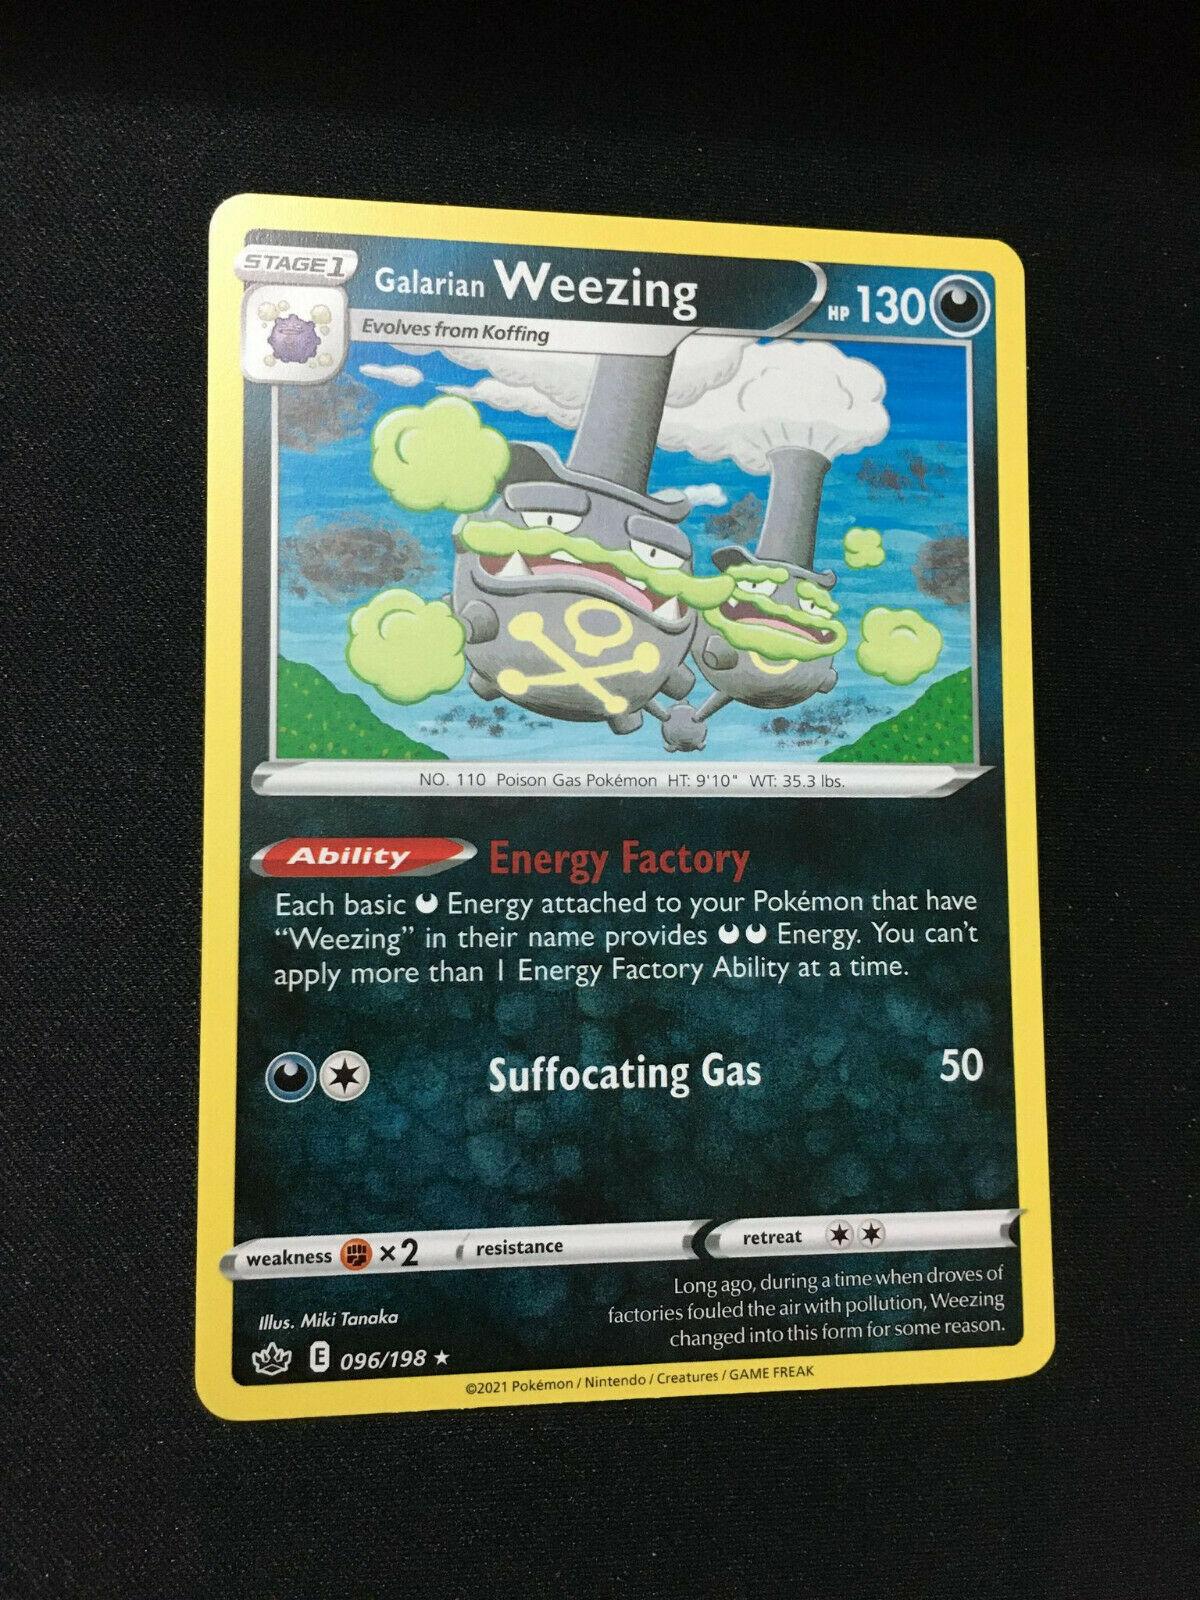 Pokemon TCG Galarian Weezing Rare Card Chilling Reign SWSH06 096/198